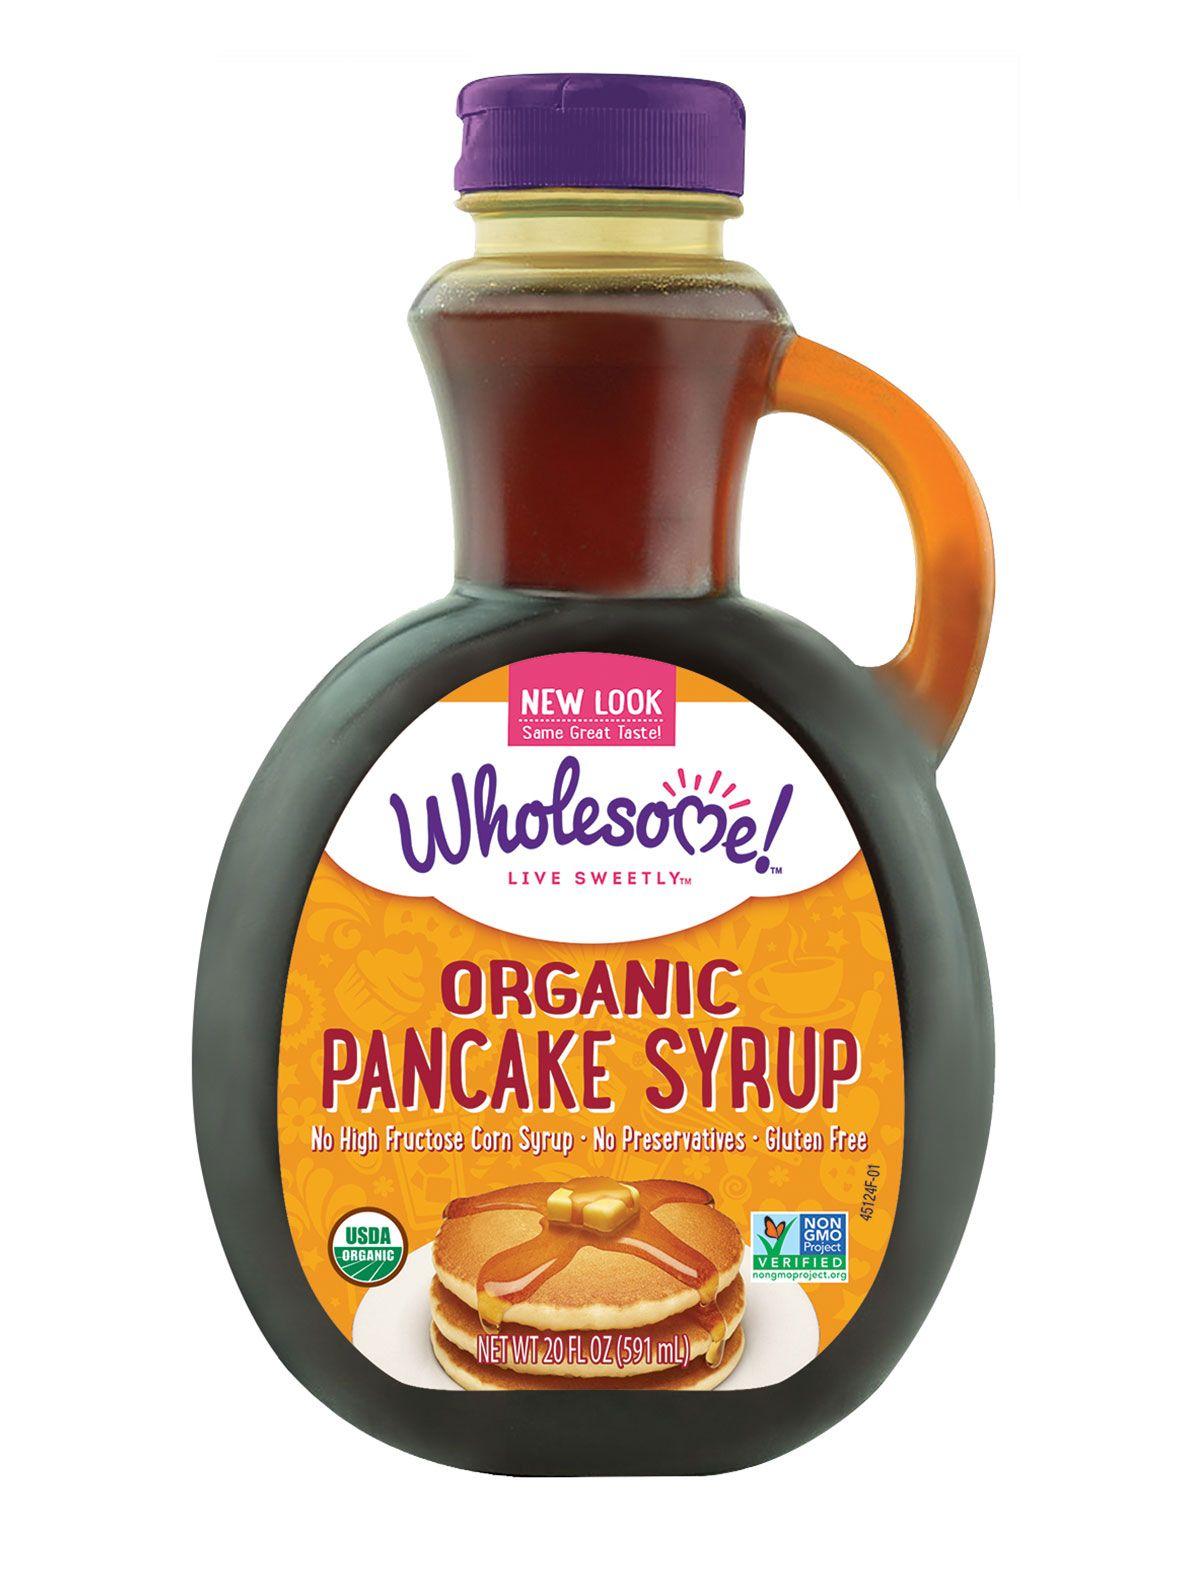 Organic Pancake Syrup Wholesome Sweeteners Organic Pancakes Pancake Syrup